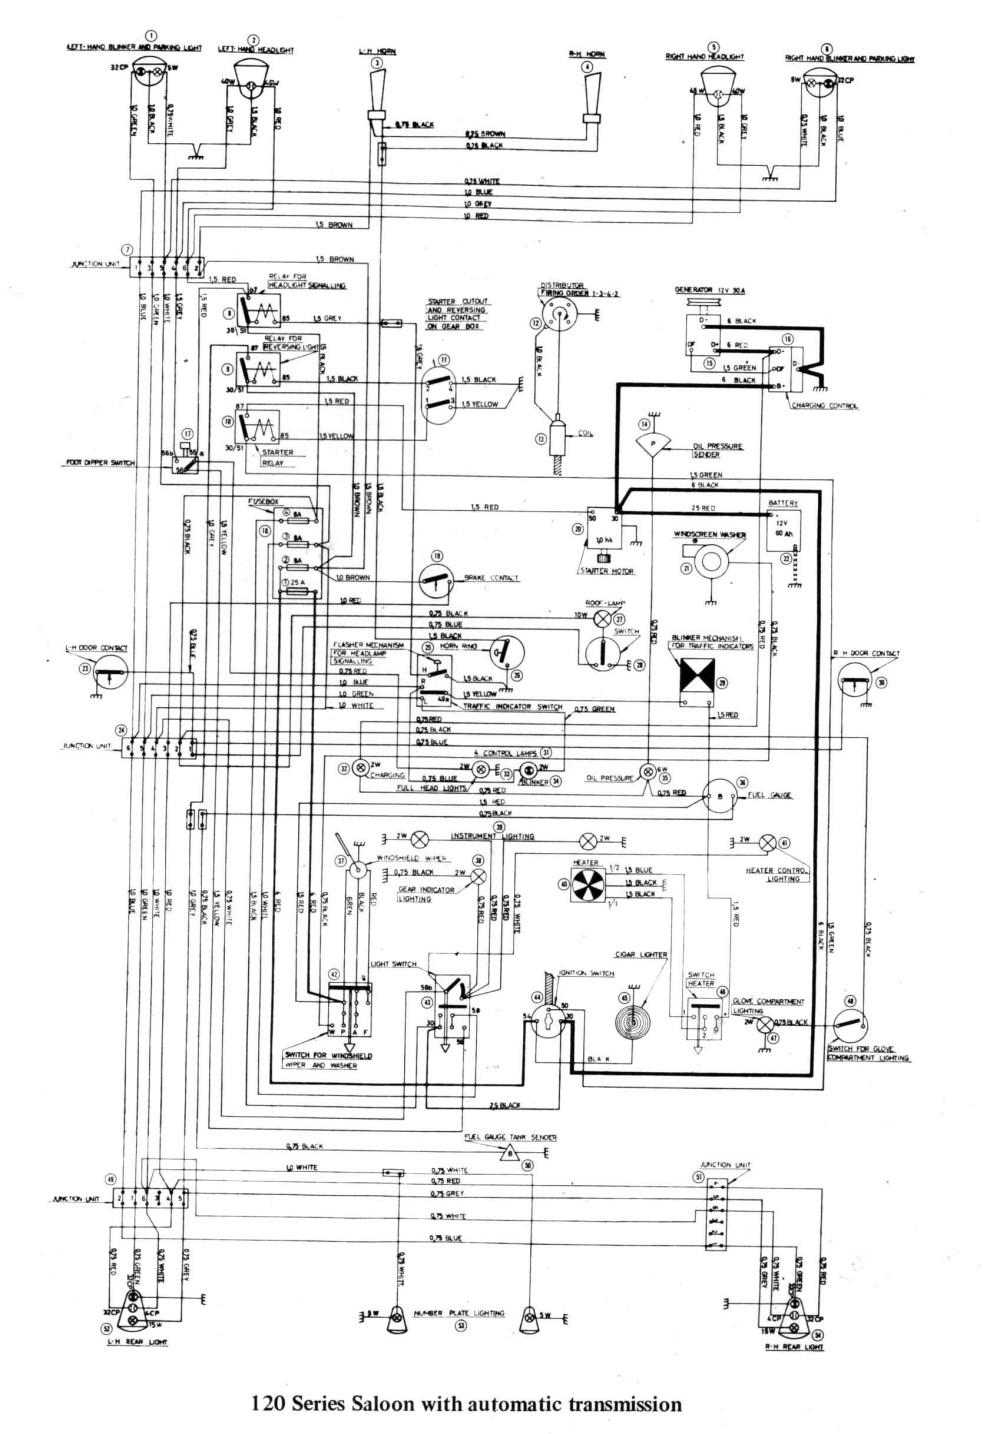 medium resolution of ohv engine diagram honda c70 wiring diagram s valid wiring diagram honda c70 of ohv engine